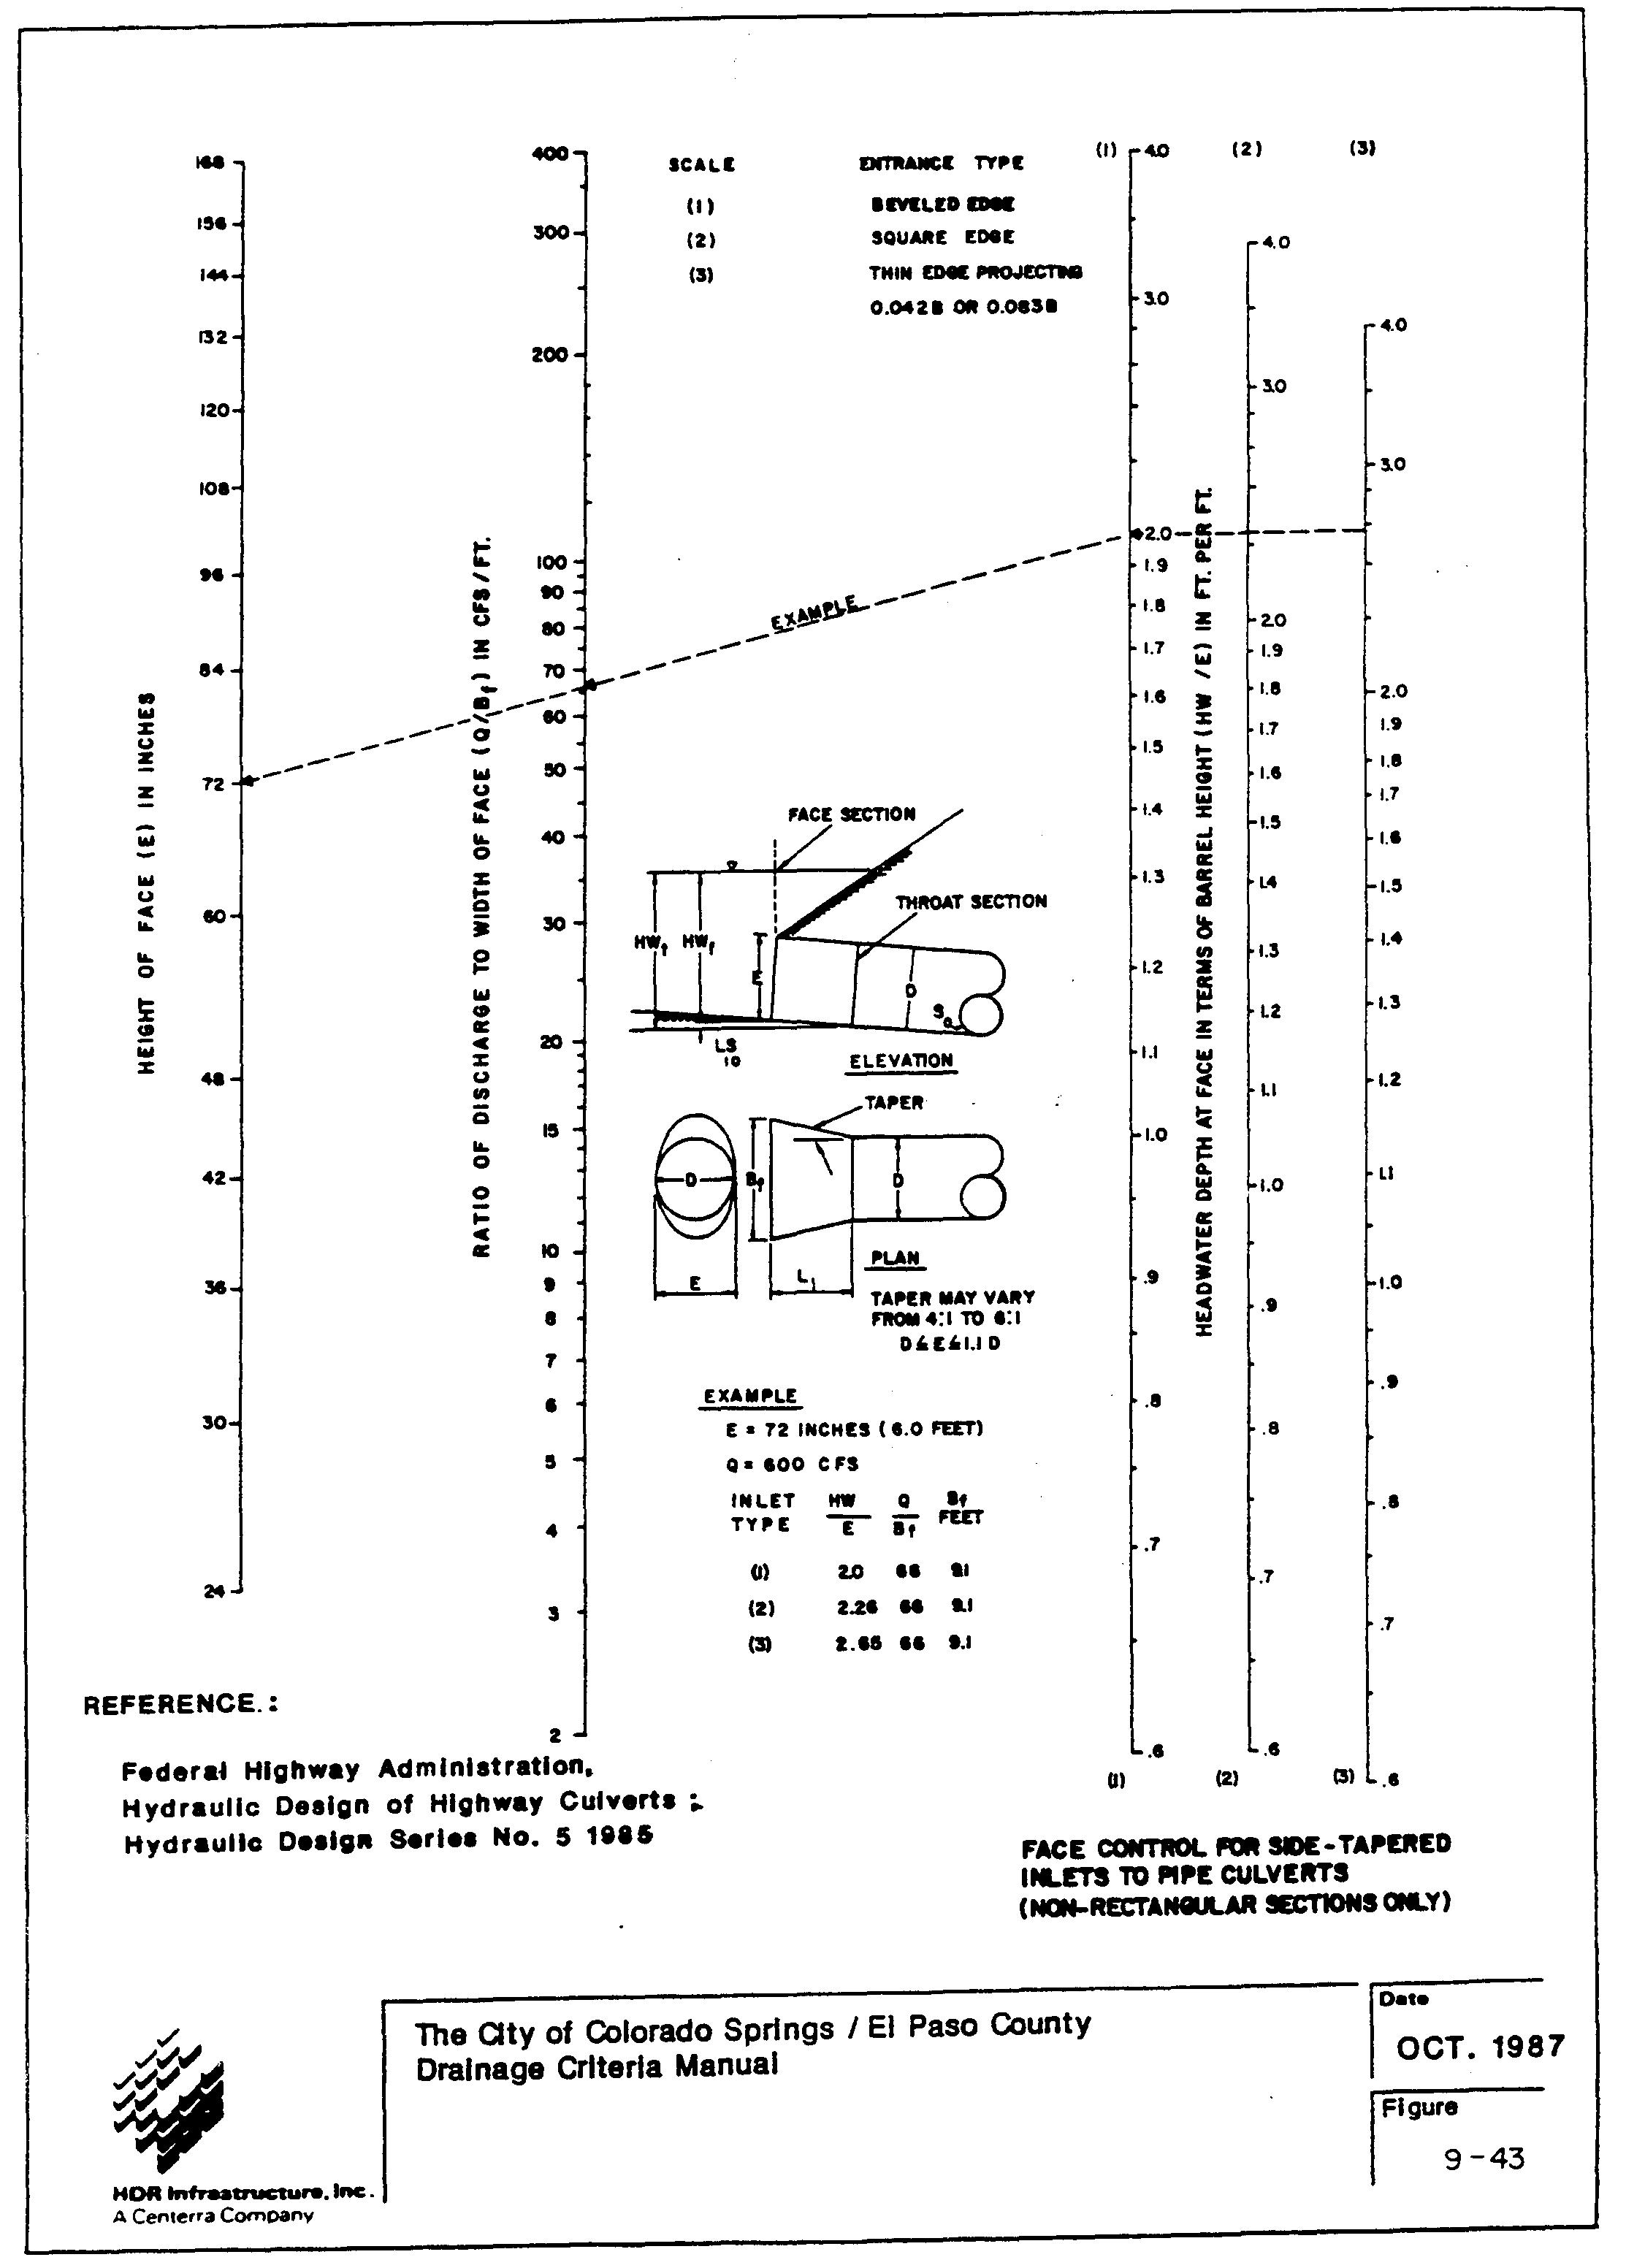 SECTION III - DESIGN METHODS | Drainage Criteria Manual | El